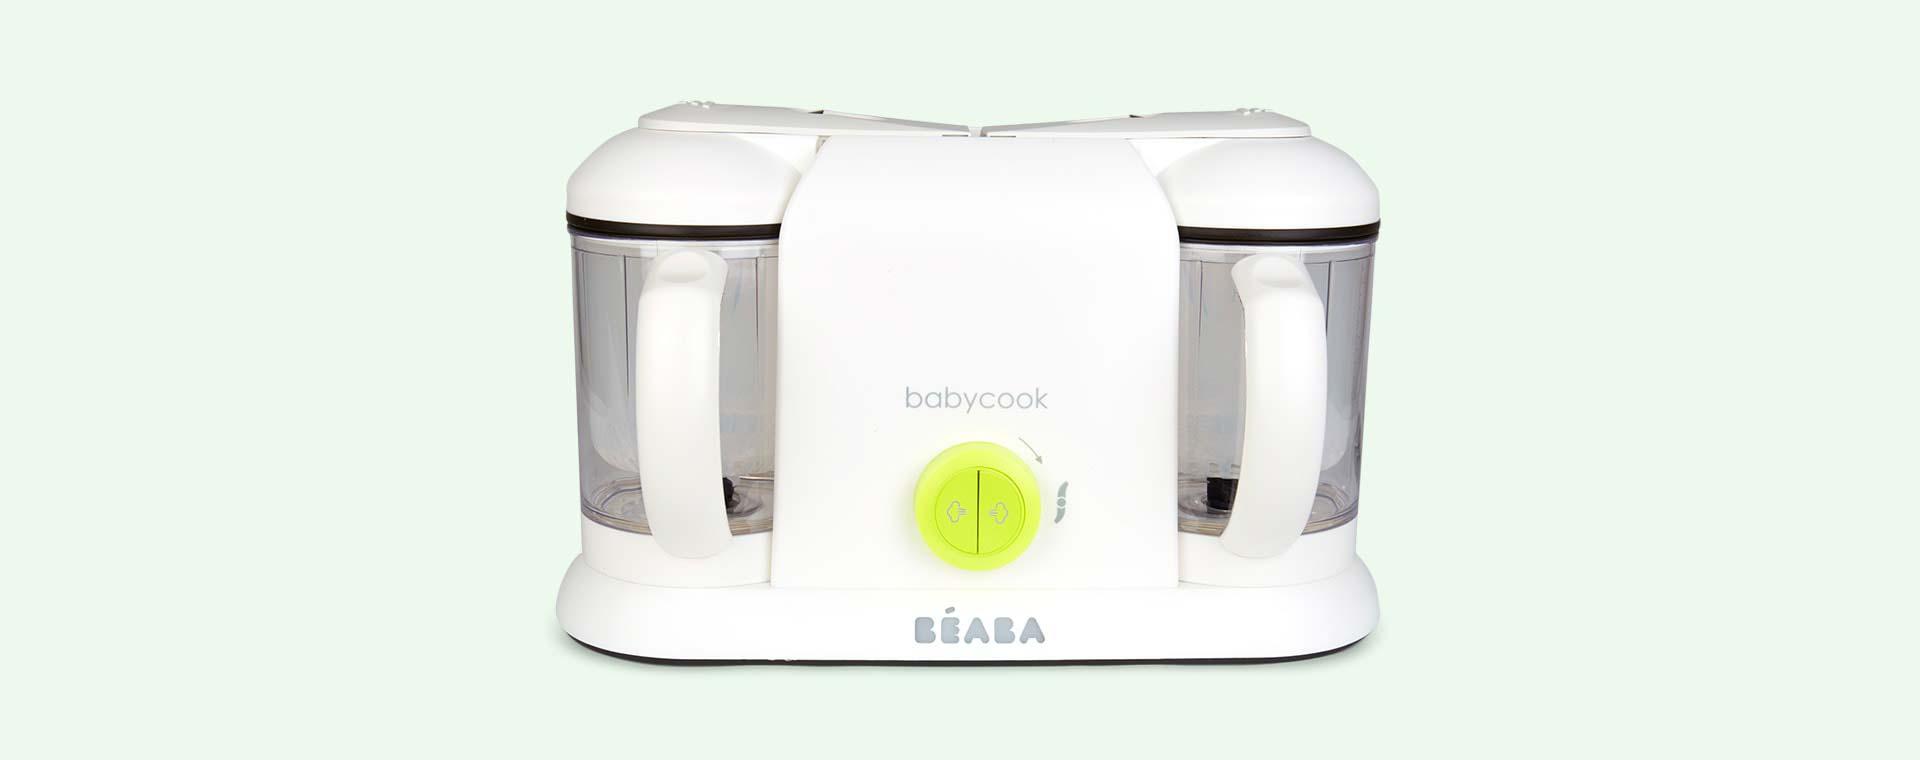 Neon Beaba Babycook Plus 4-in-1 Food Processor